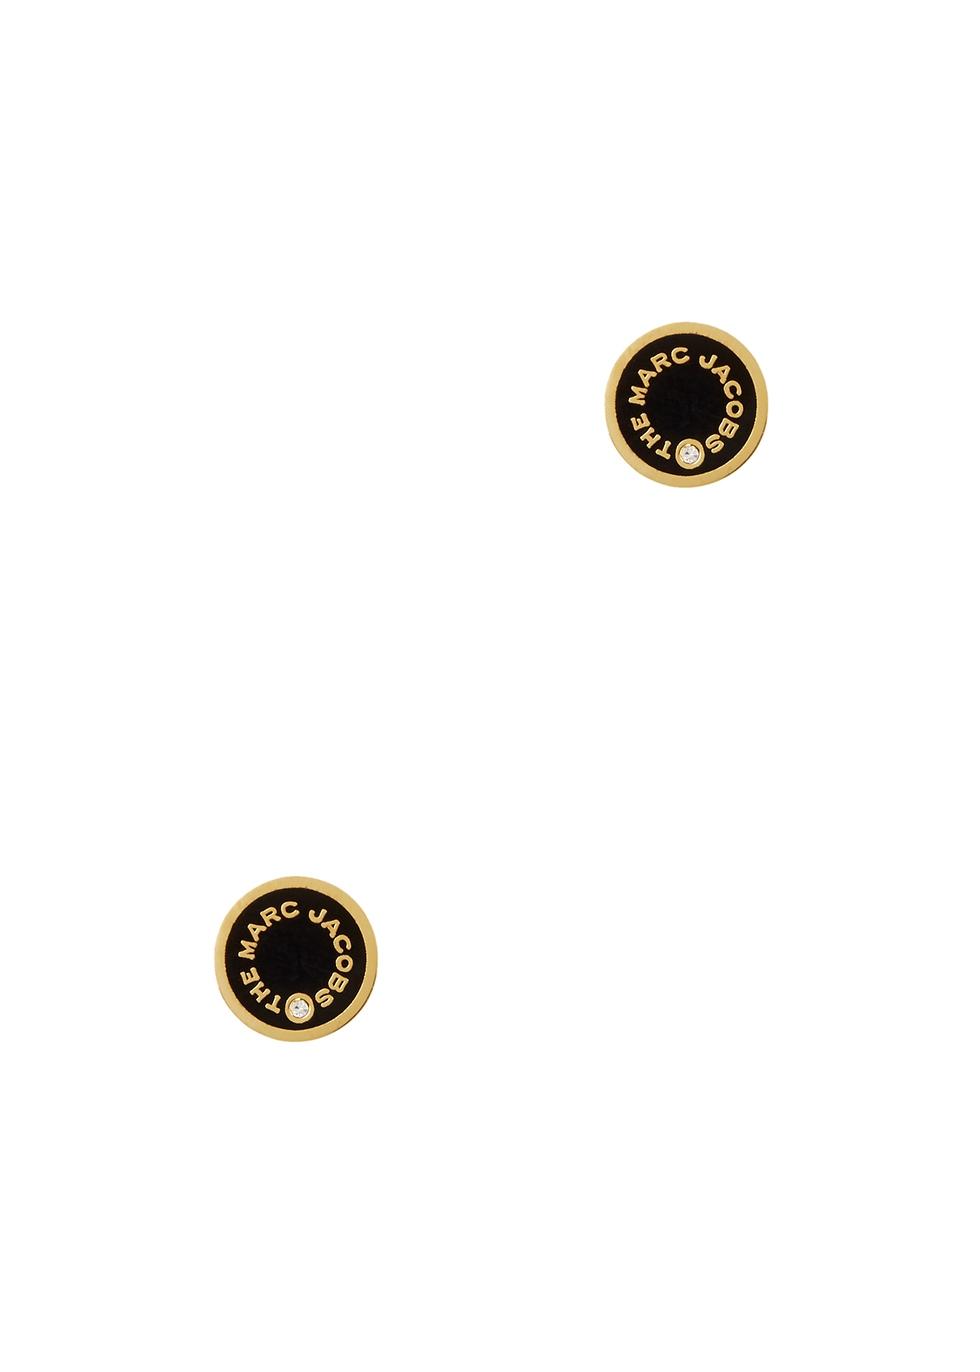 The Medallion gold-tone stud earrings